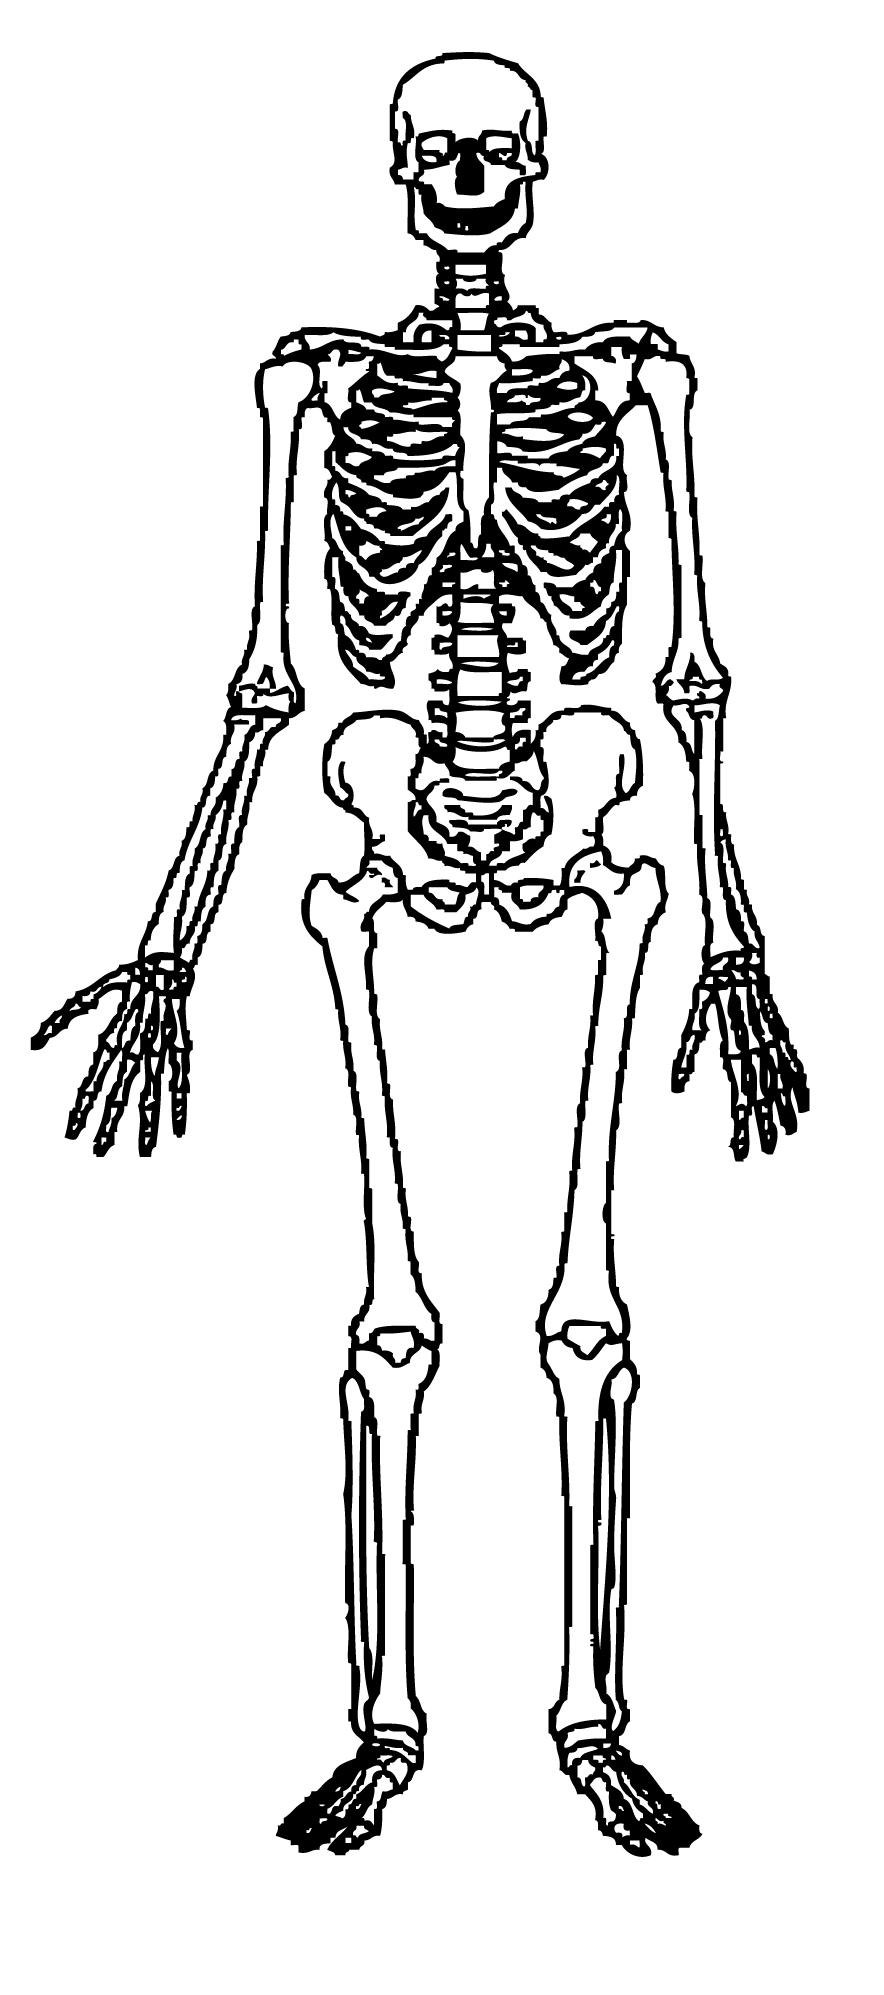 Skeleton clipart for kids jpg freeuse library Free Skeleton Clip Art Pictures - Clipartix jpg freeuse library